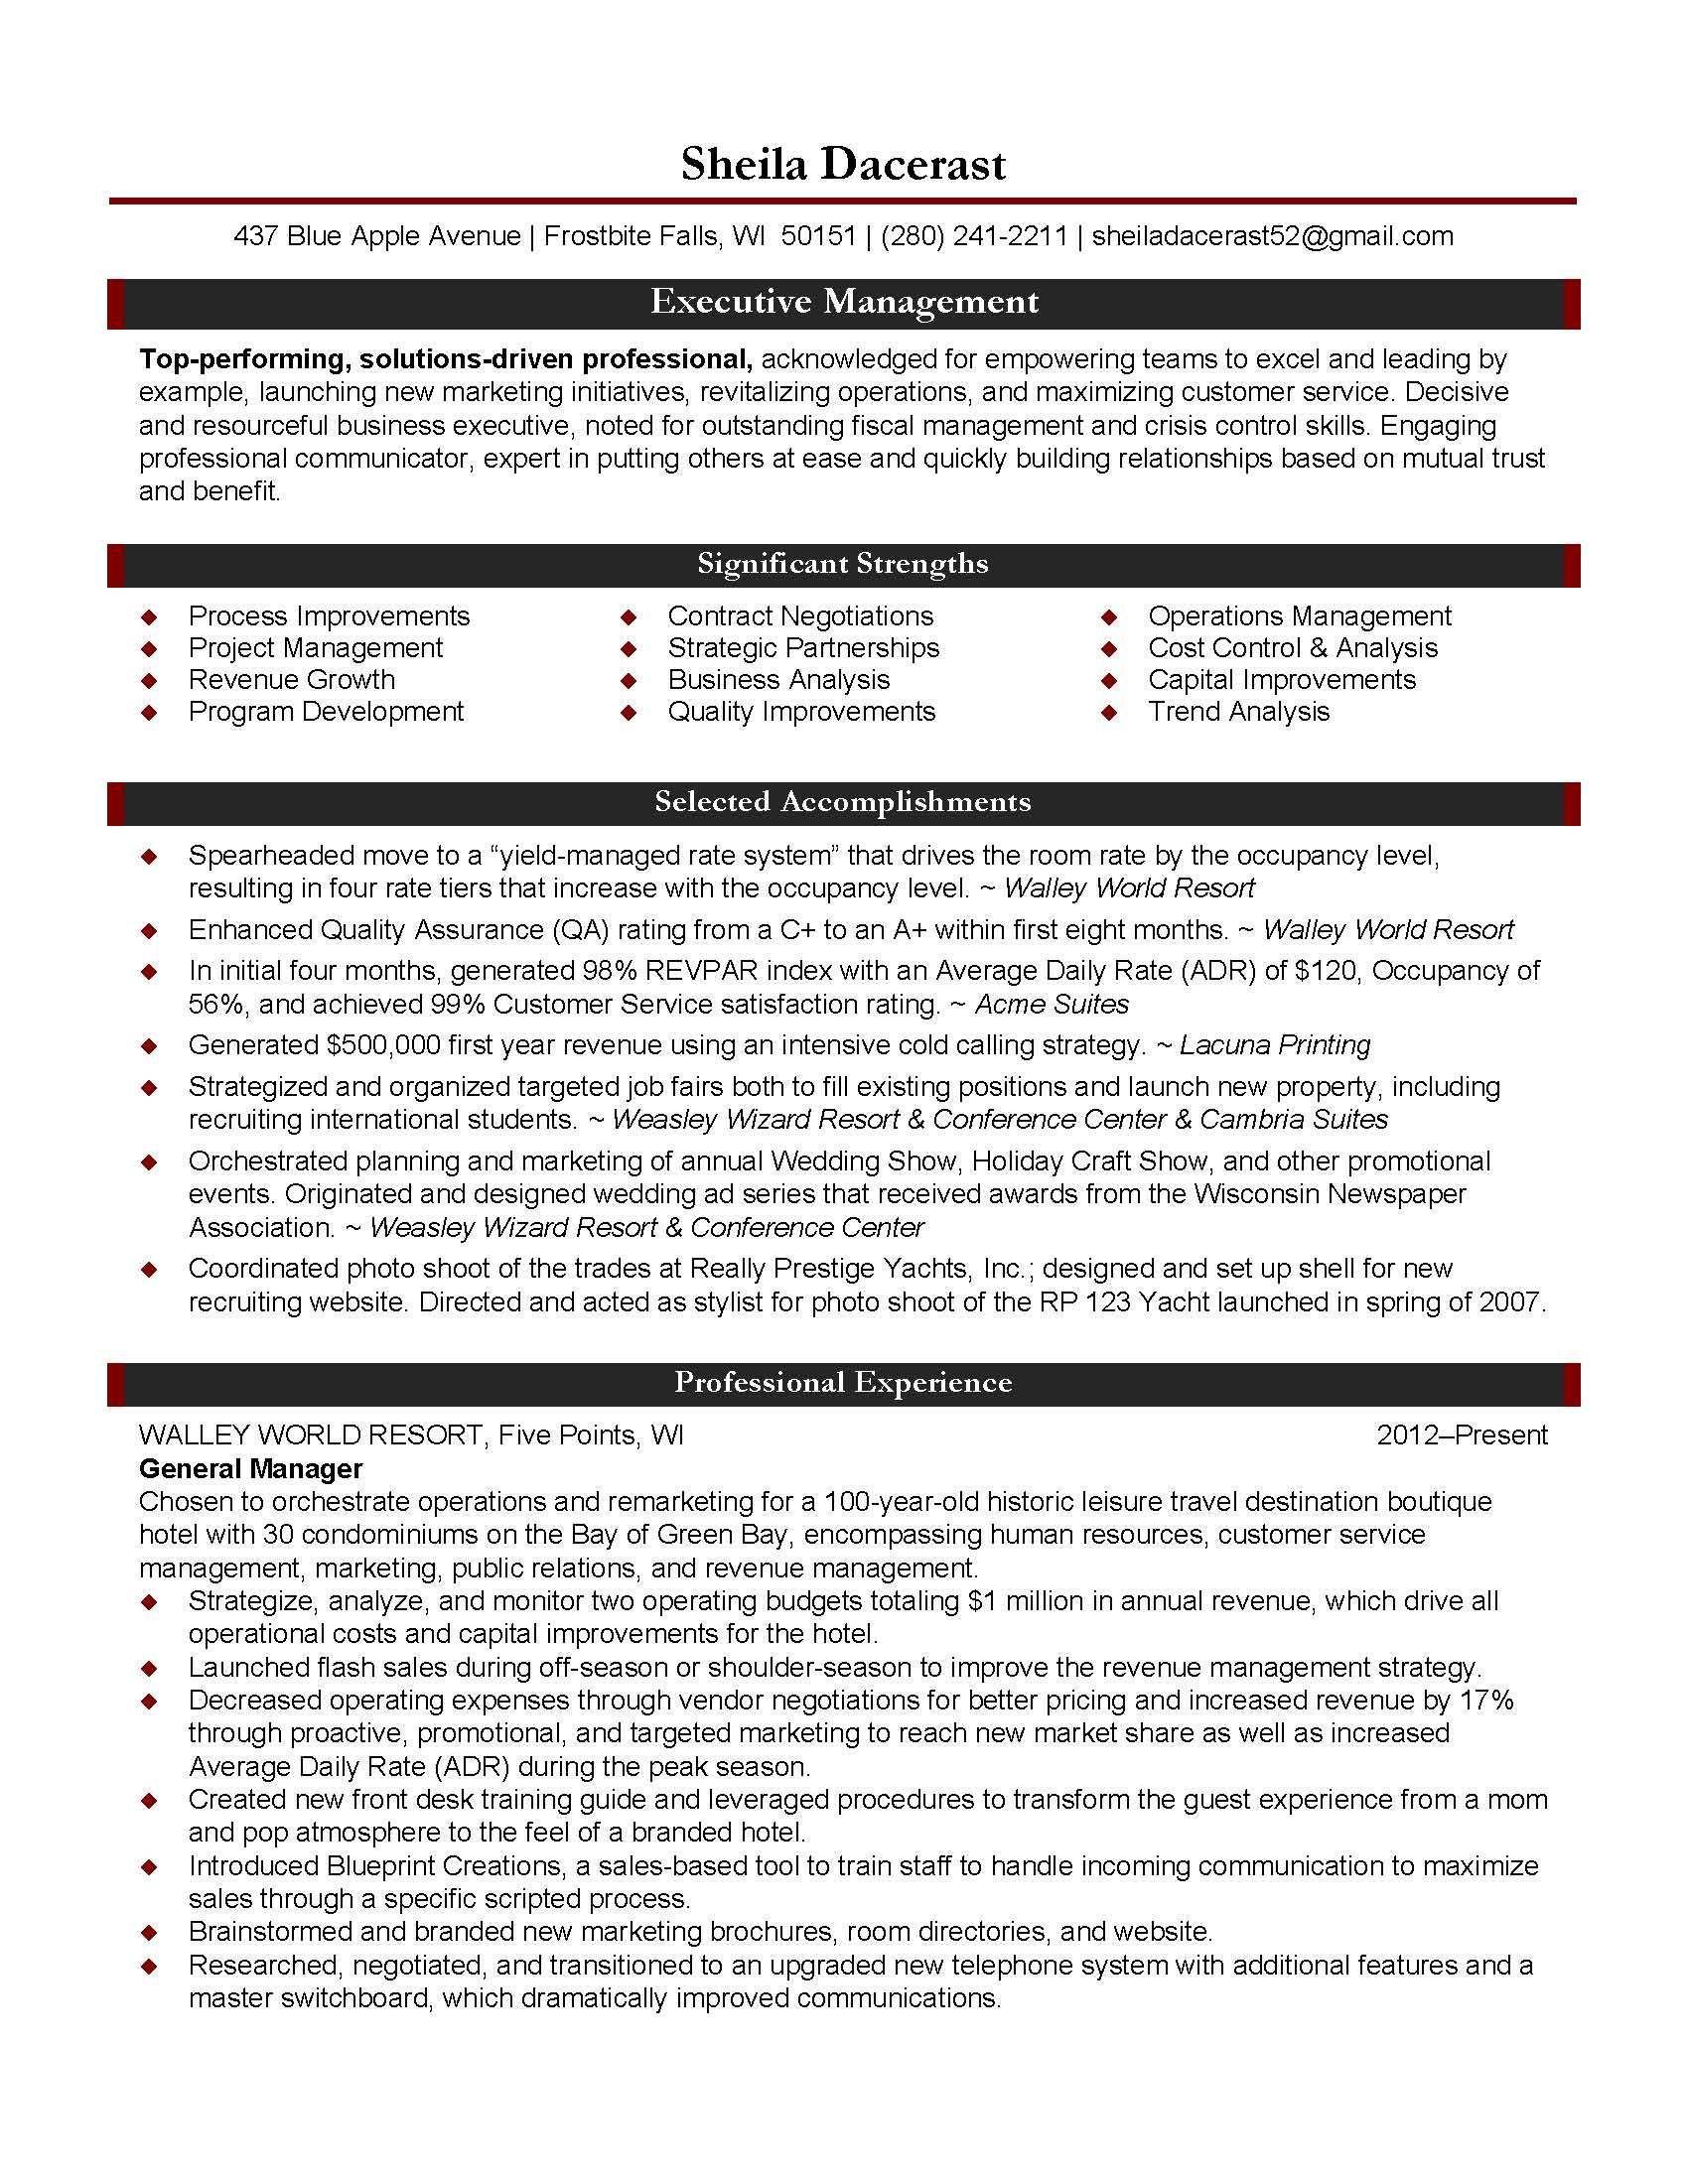 Executive Director Resume Non Profit Service Project